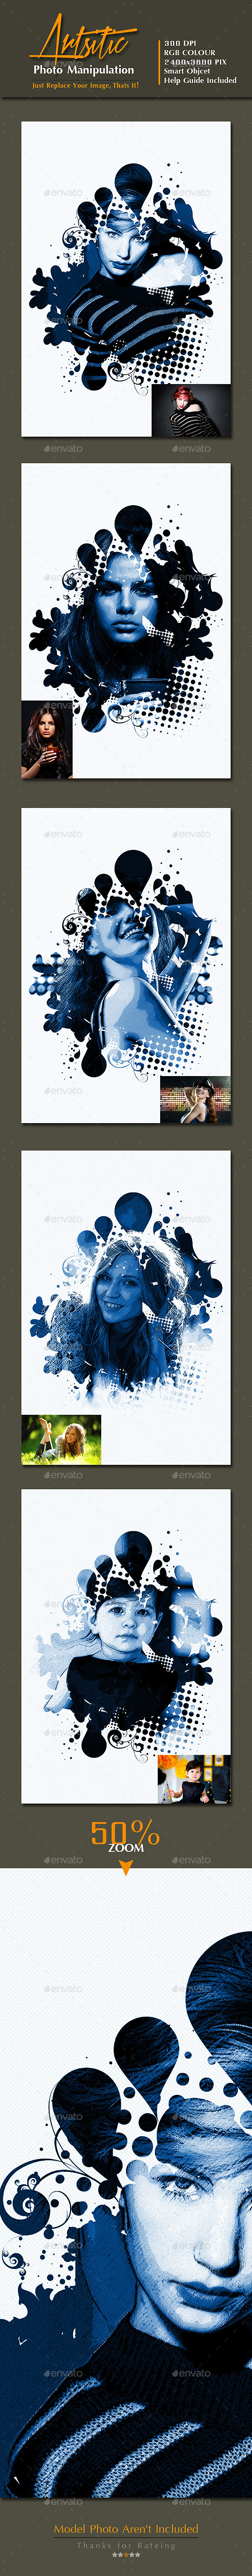 GraphicRiver Artistic Photo Manipulation vol 3 9981015